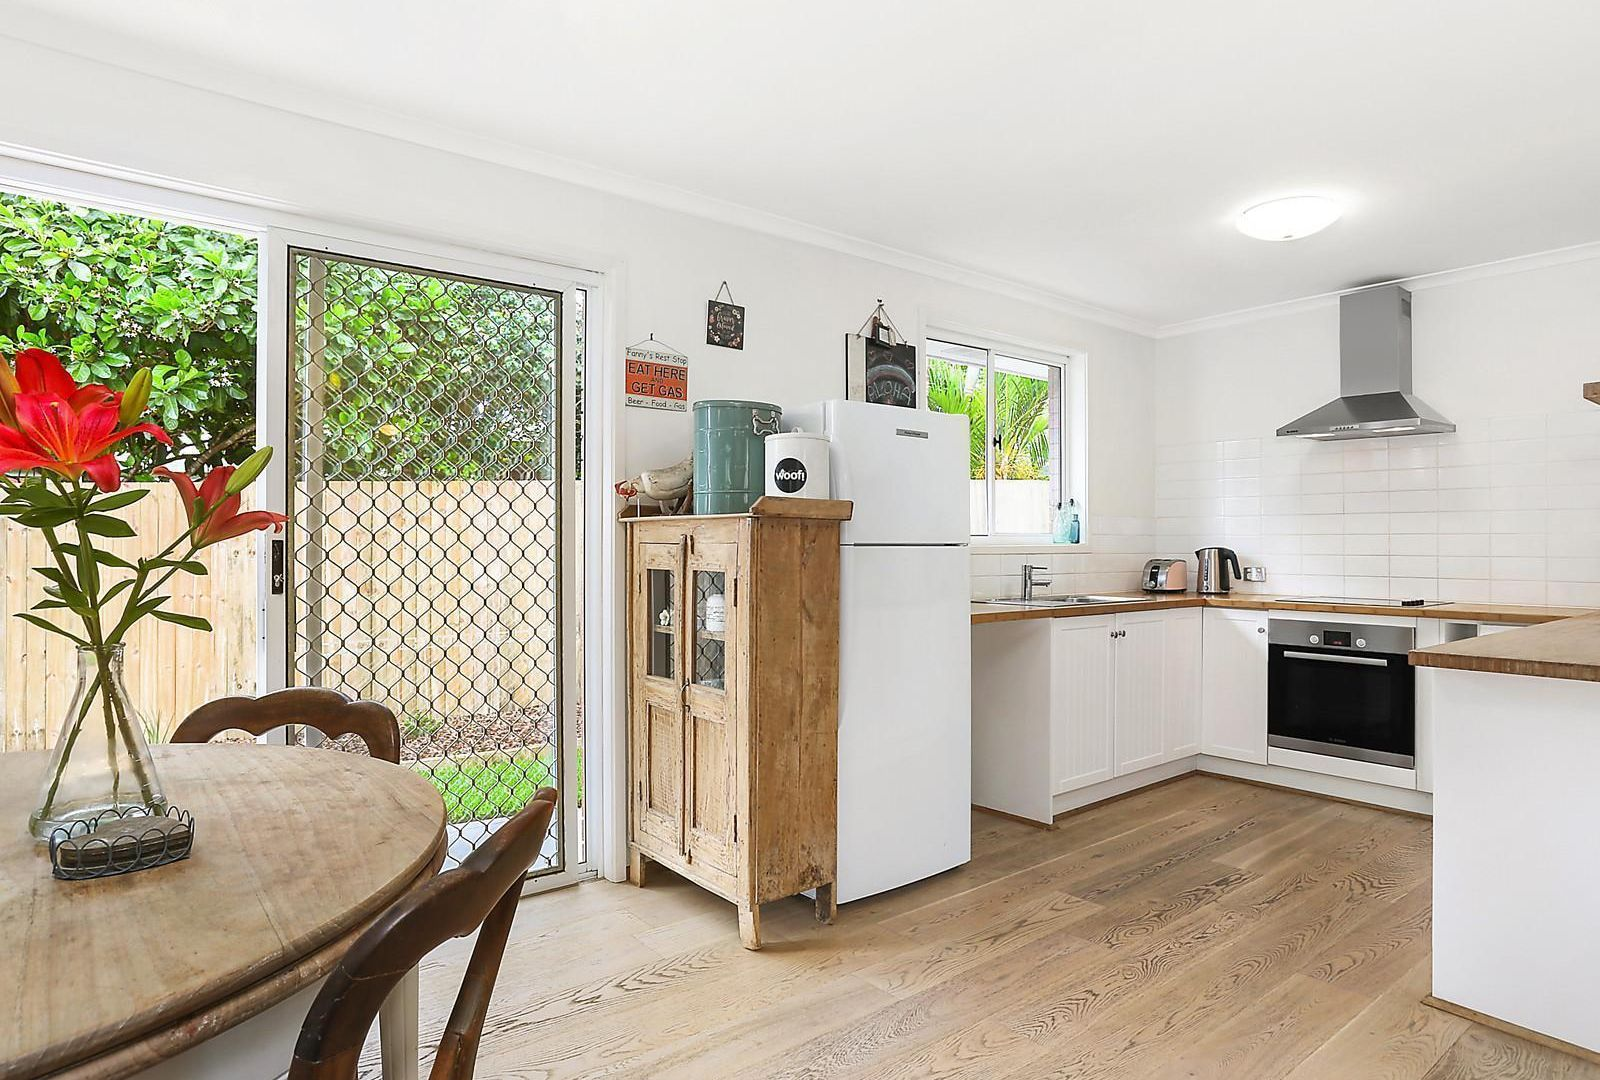 53 Gympie Street, Tewantin QLD 4565, Image 2